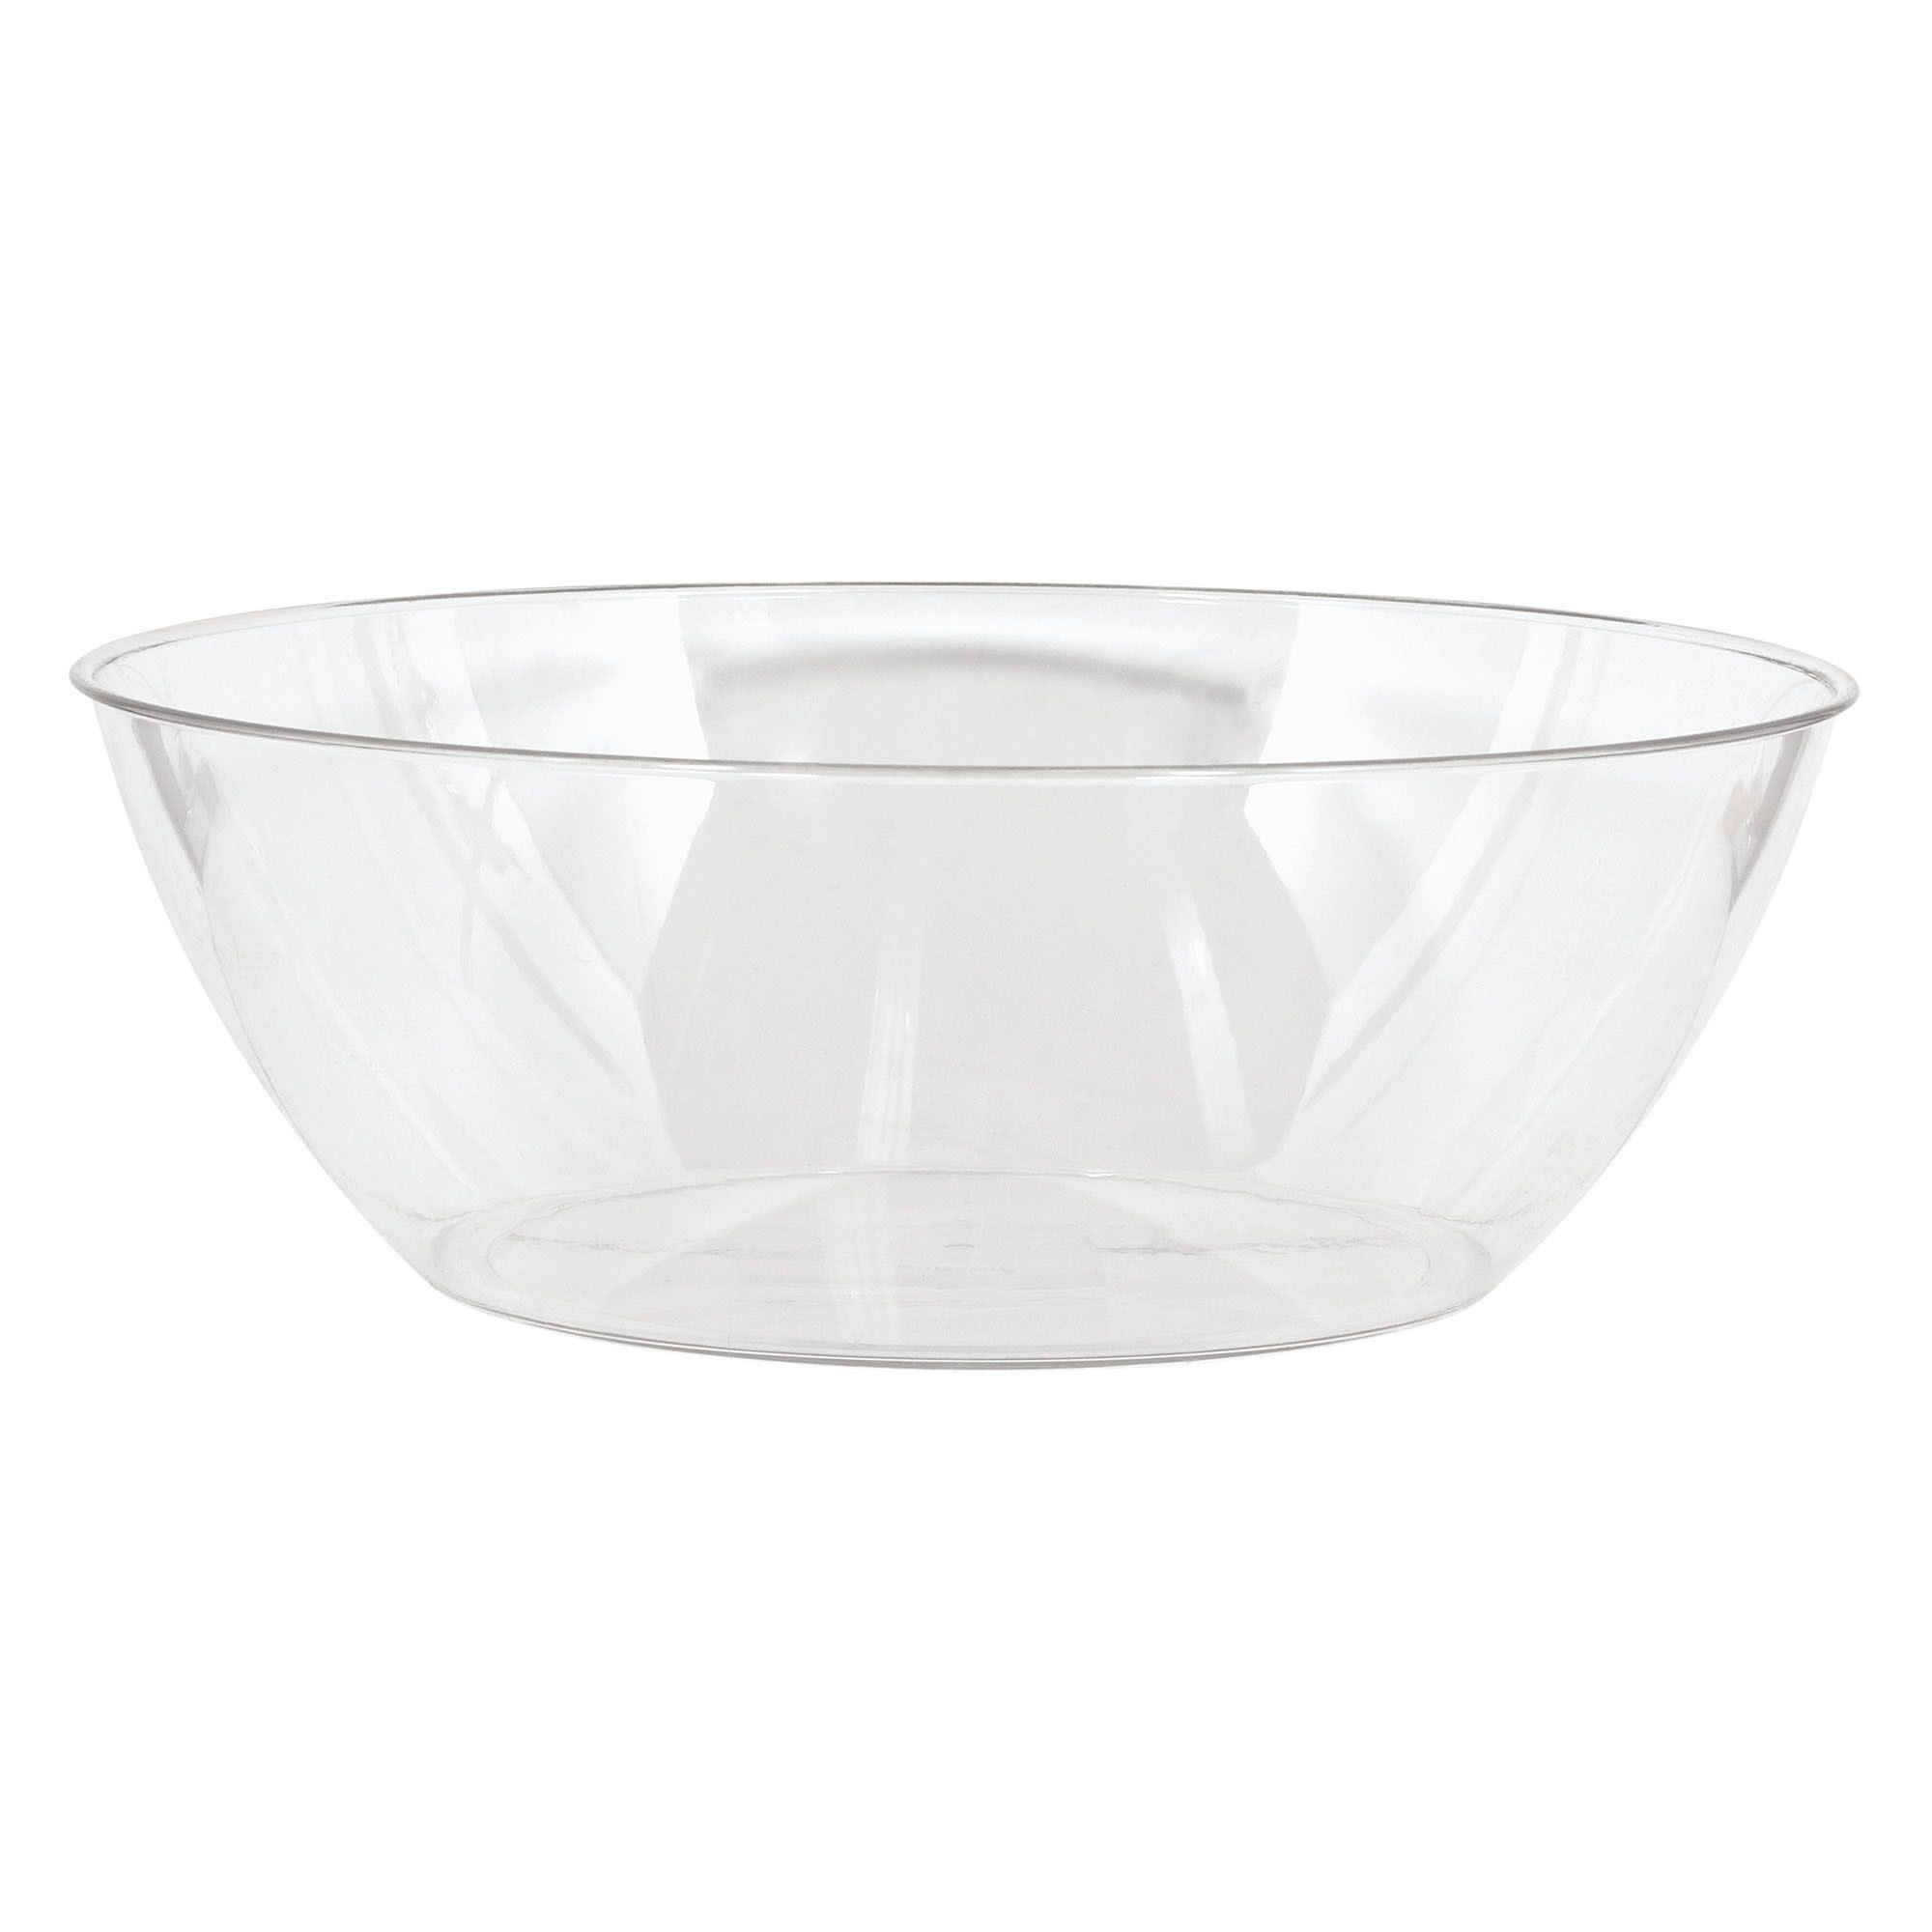 10 Qts. Bowl - Clear